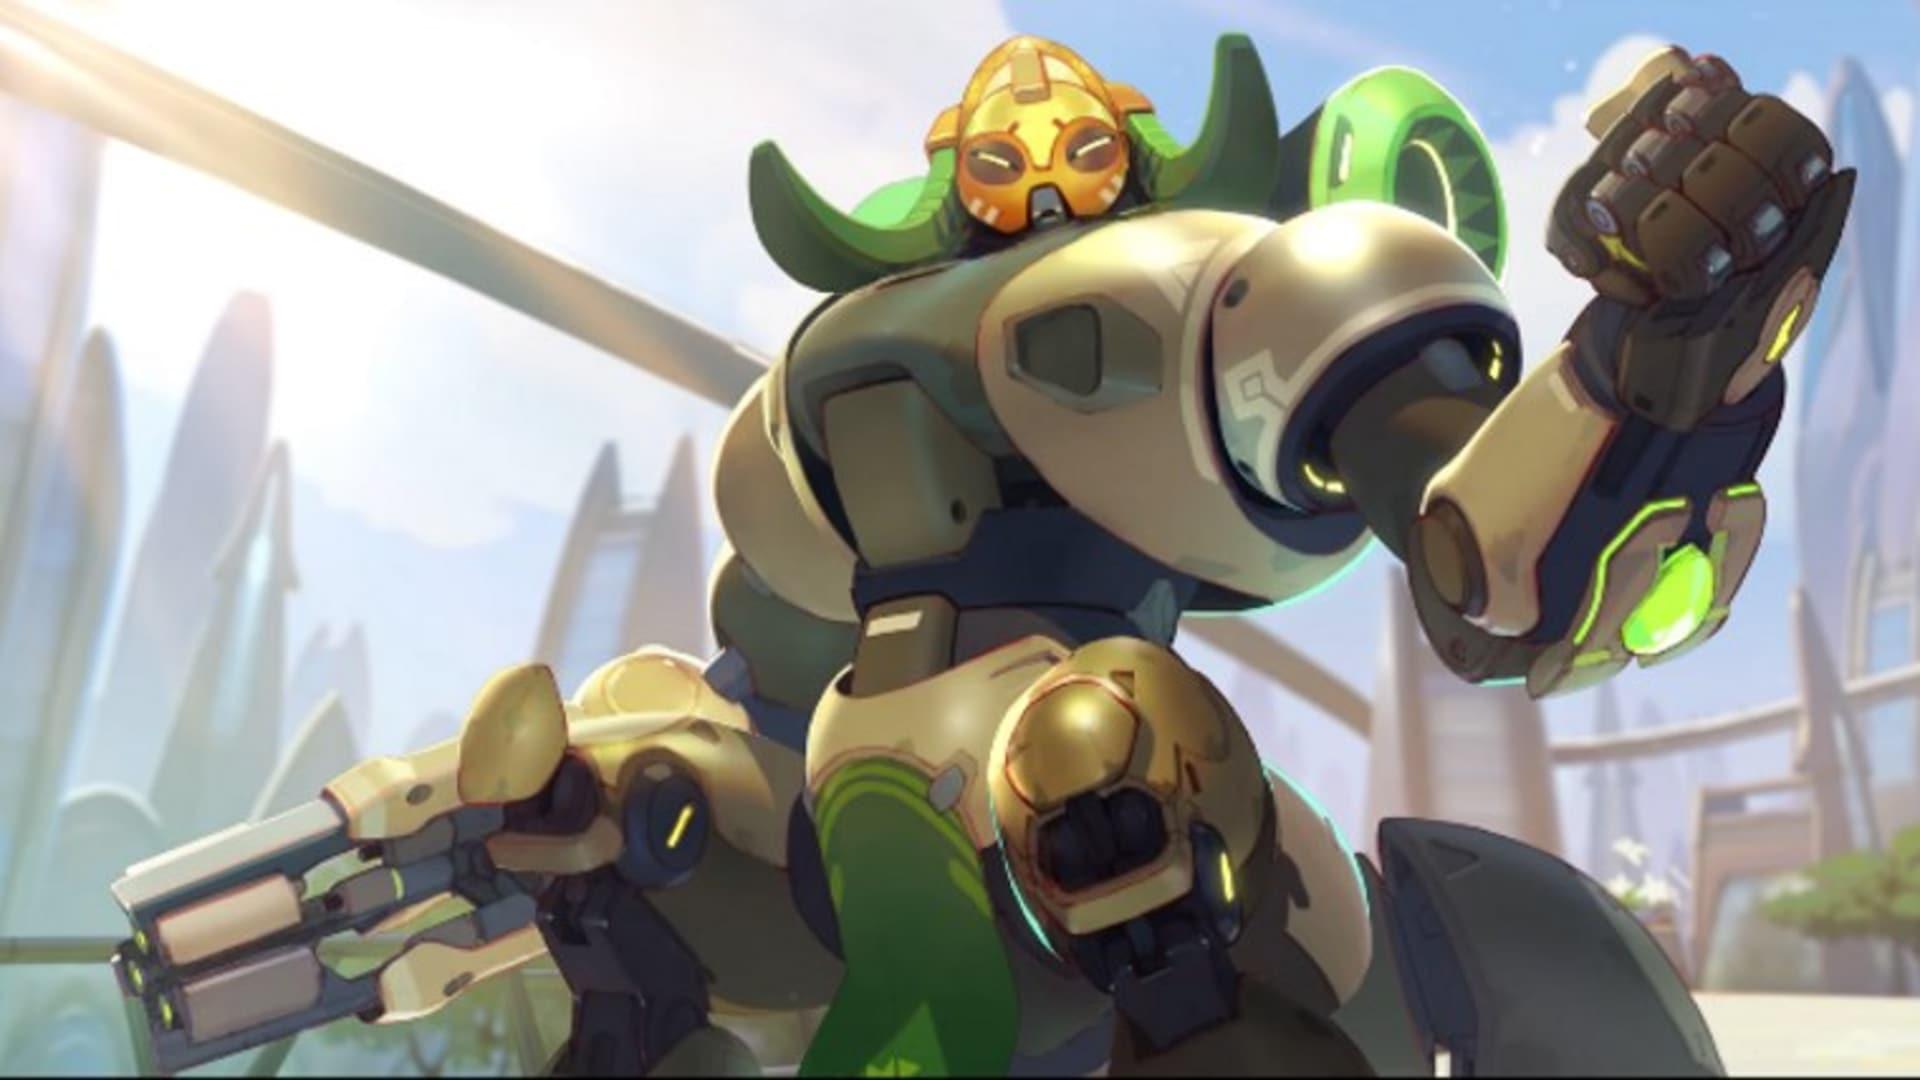 Nya Overwatch-hjälten Orisa dyker snart upp